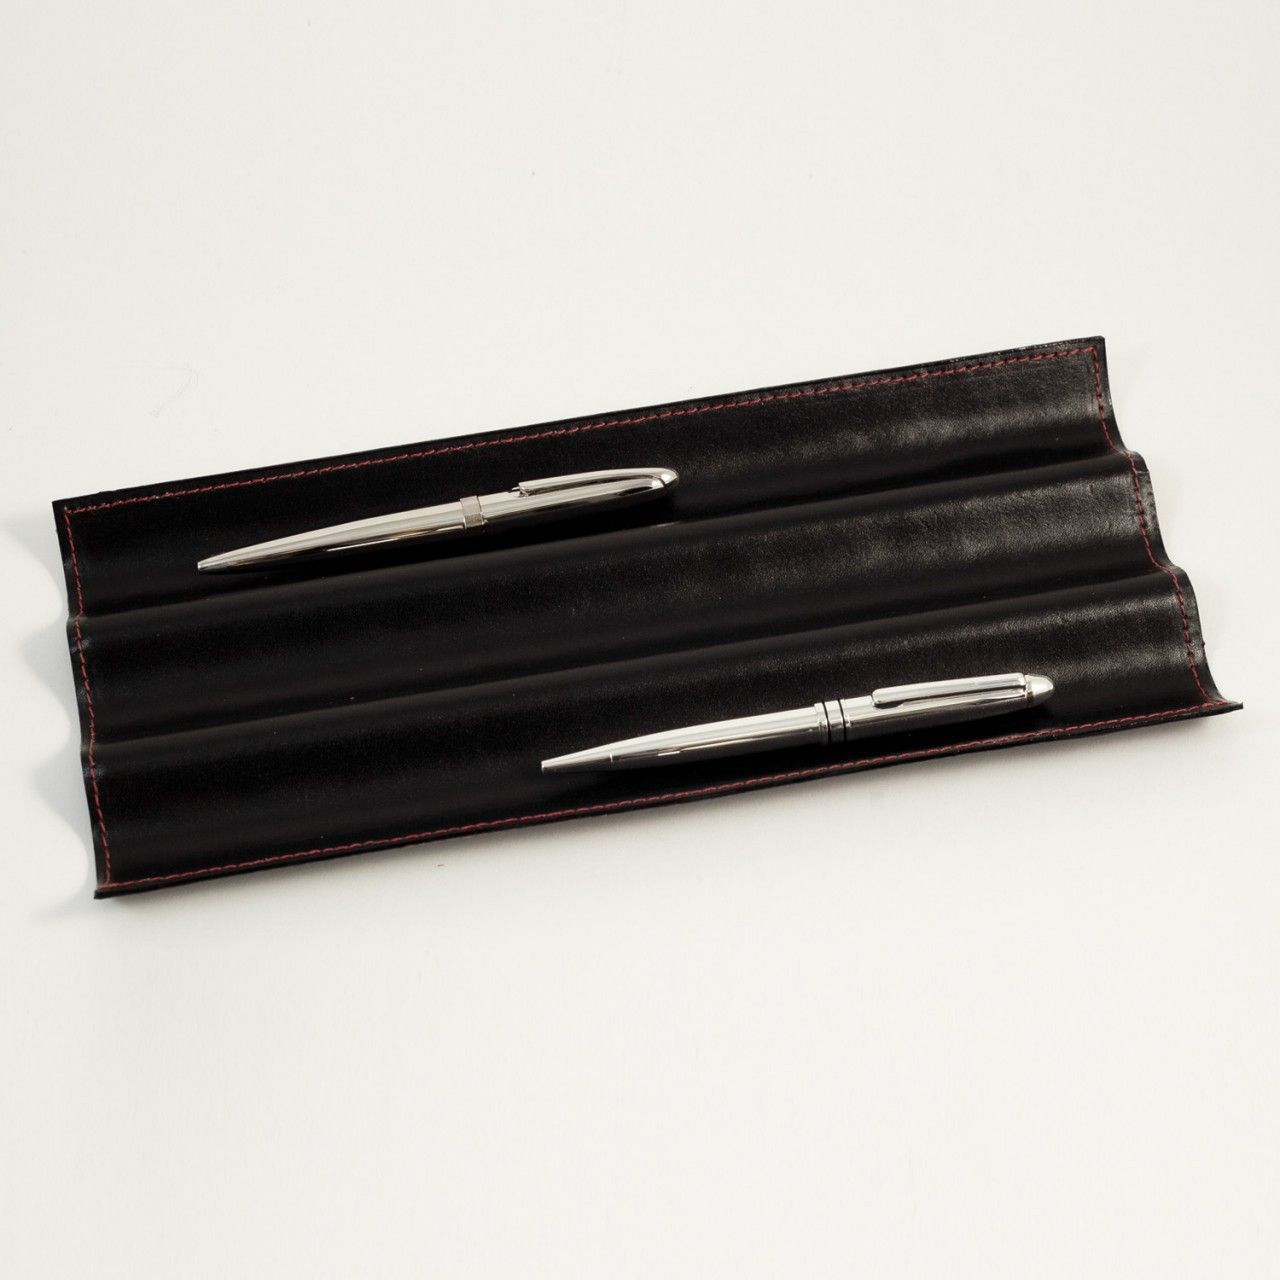 Bey Berk Black Leather Pen Tray W Red Stitching Black